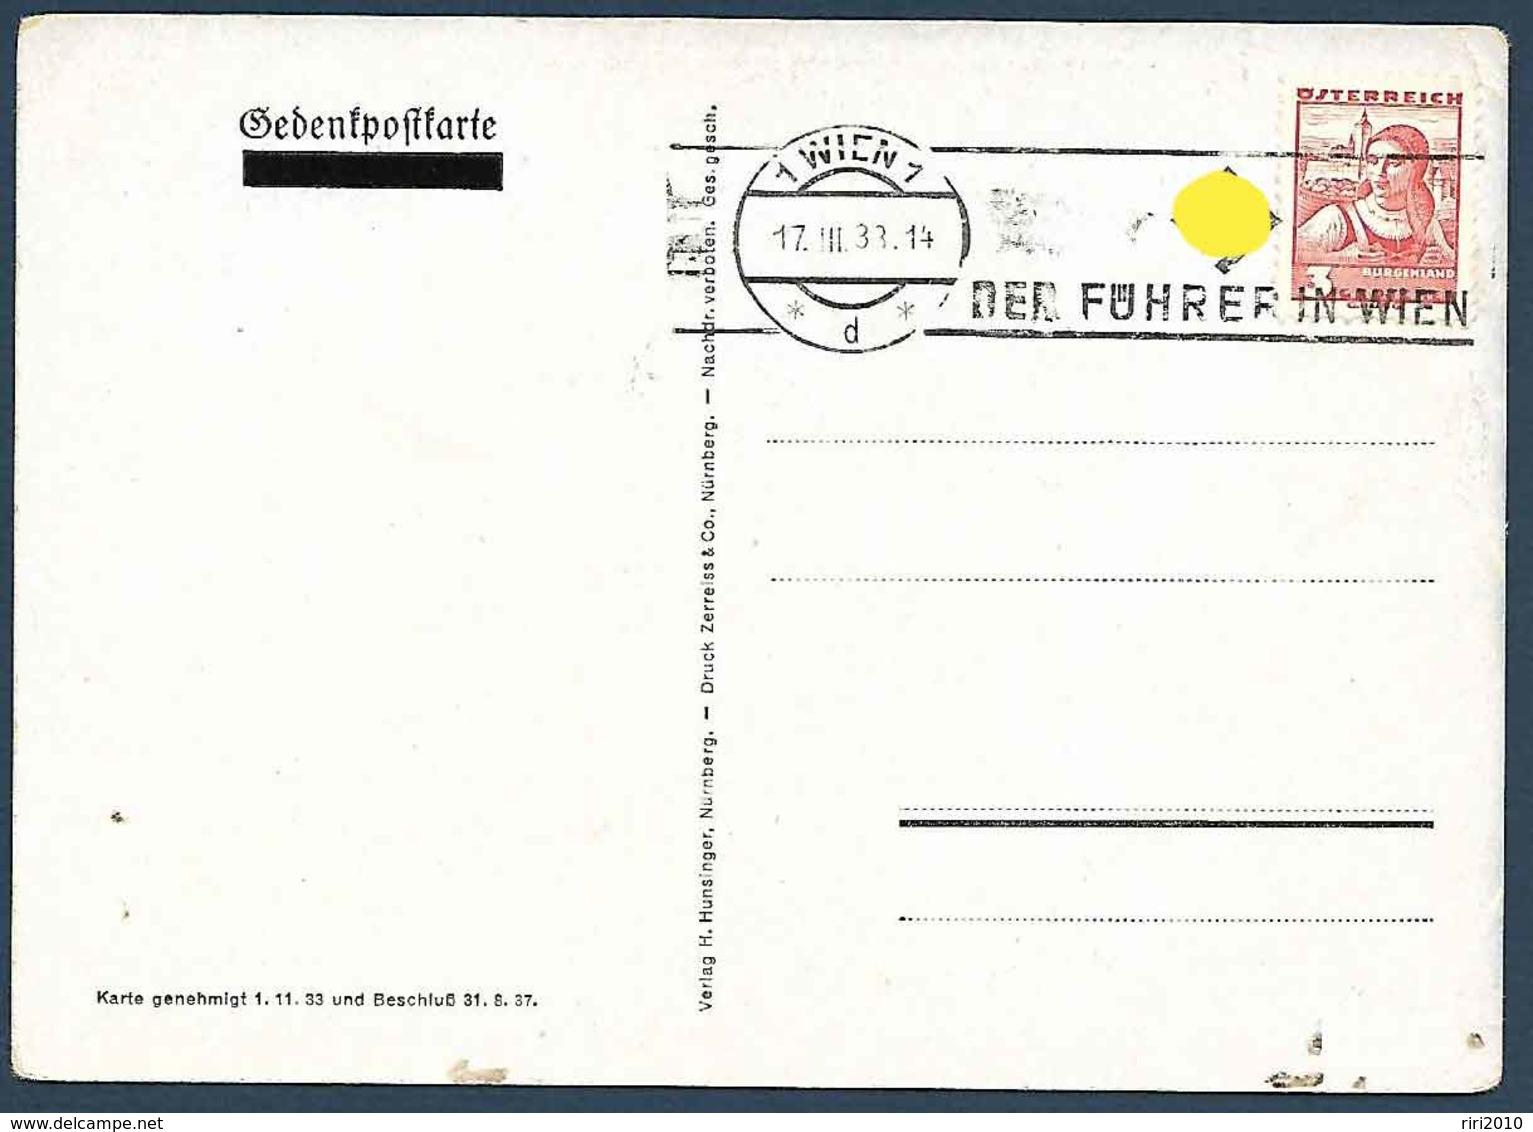 Carte De Propagande - Und Jhr Habt Doch Gesiegt -1933 - Militaria